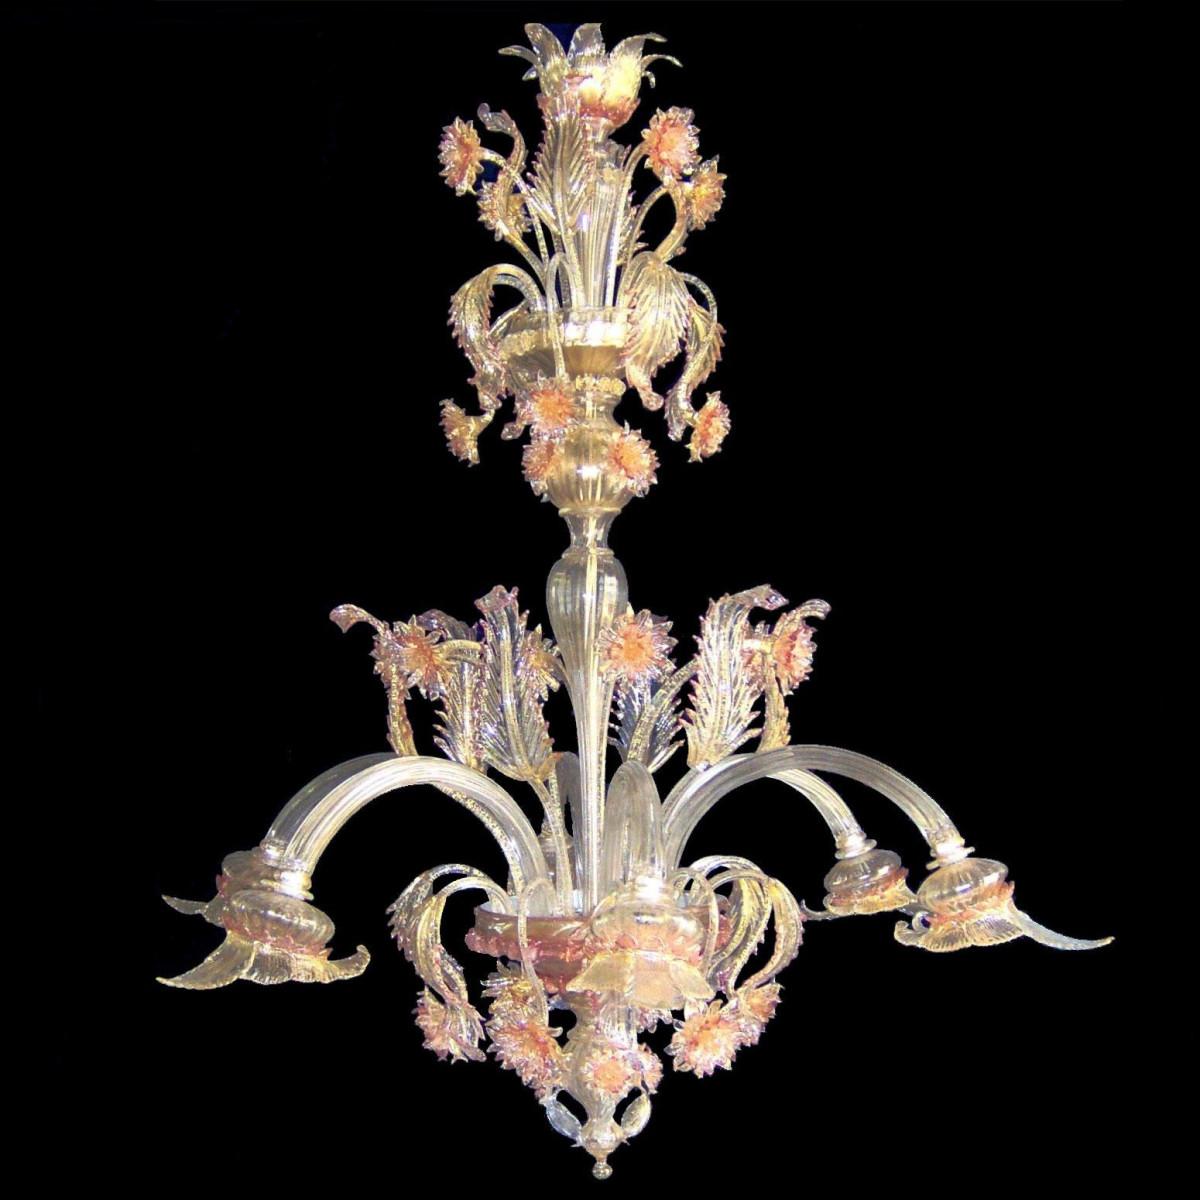 """Gisella"" Murano glass chandelier - 6 lights"